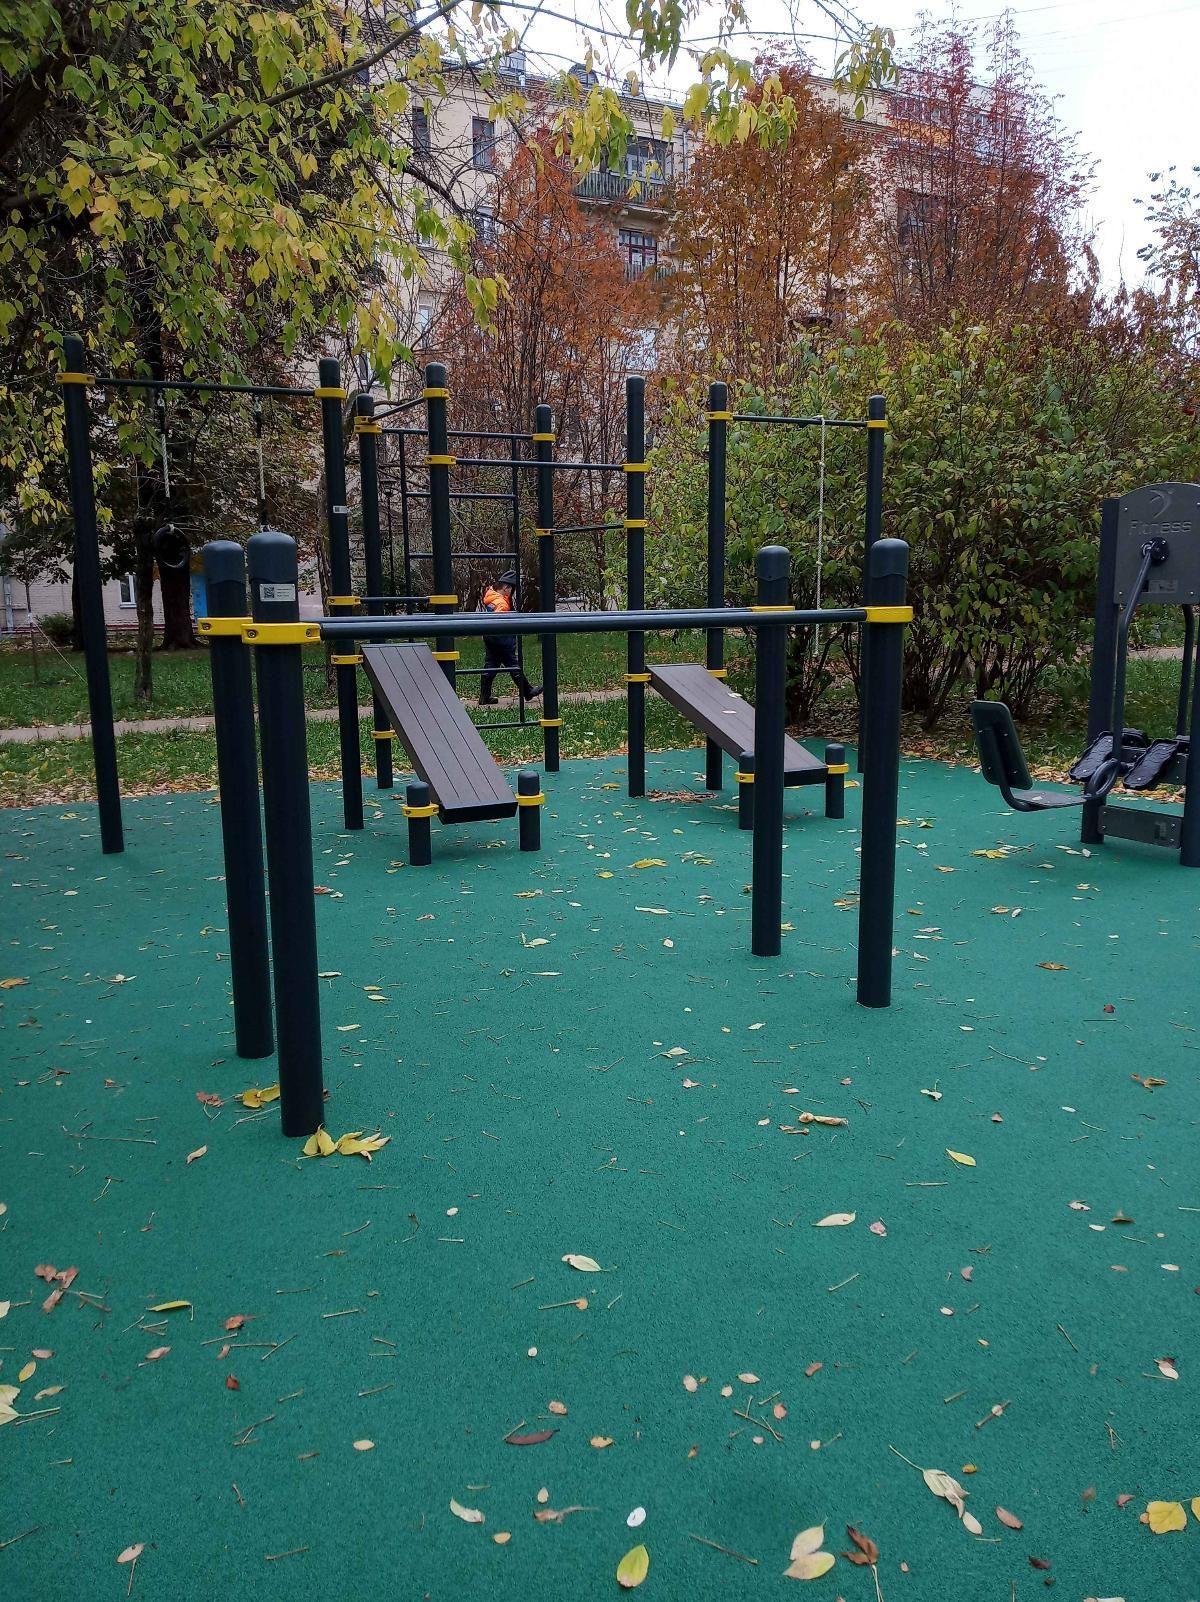 Moscow - Street Workout Park - Ул Кооперативная